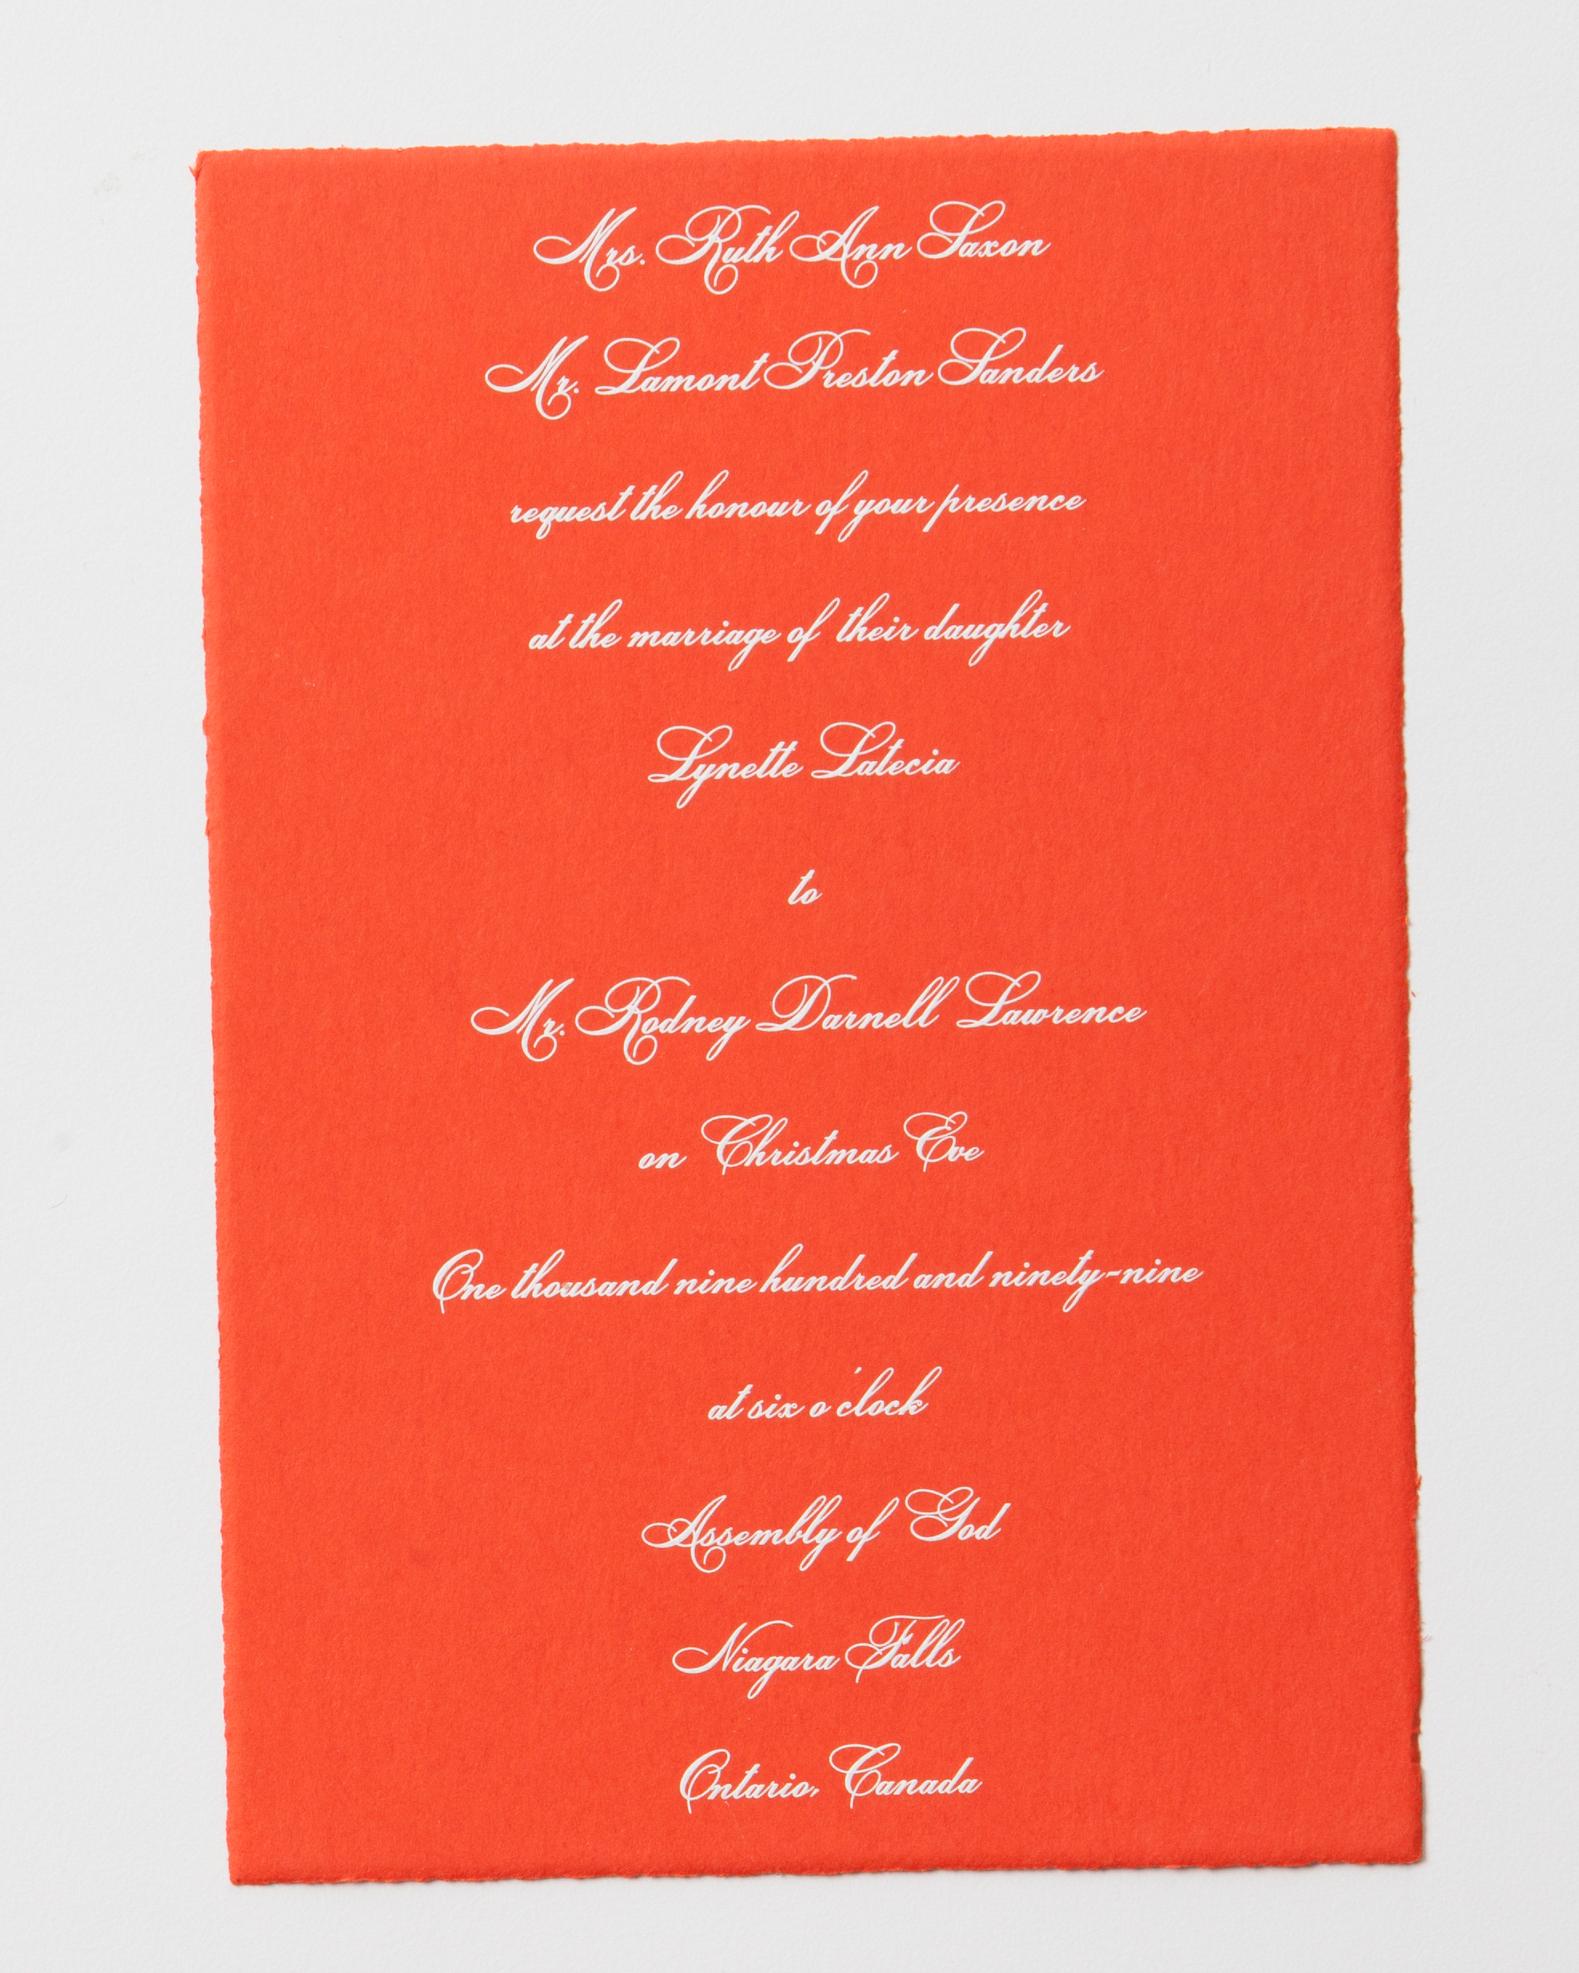 host-lines-weddings-stationery-1-divorced-parents-0517-d111607-1014.jpg